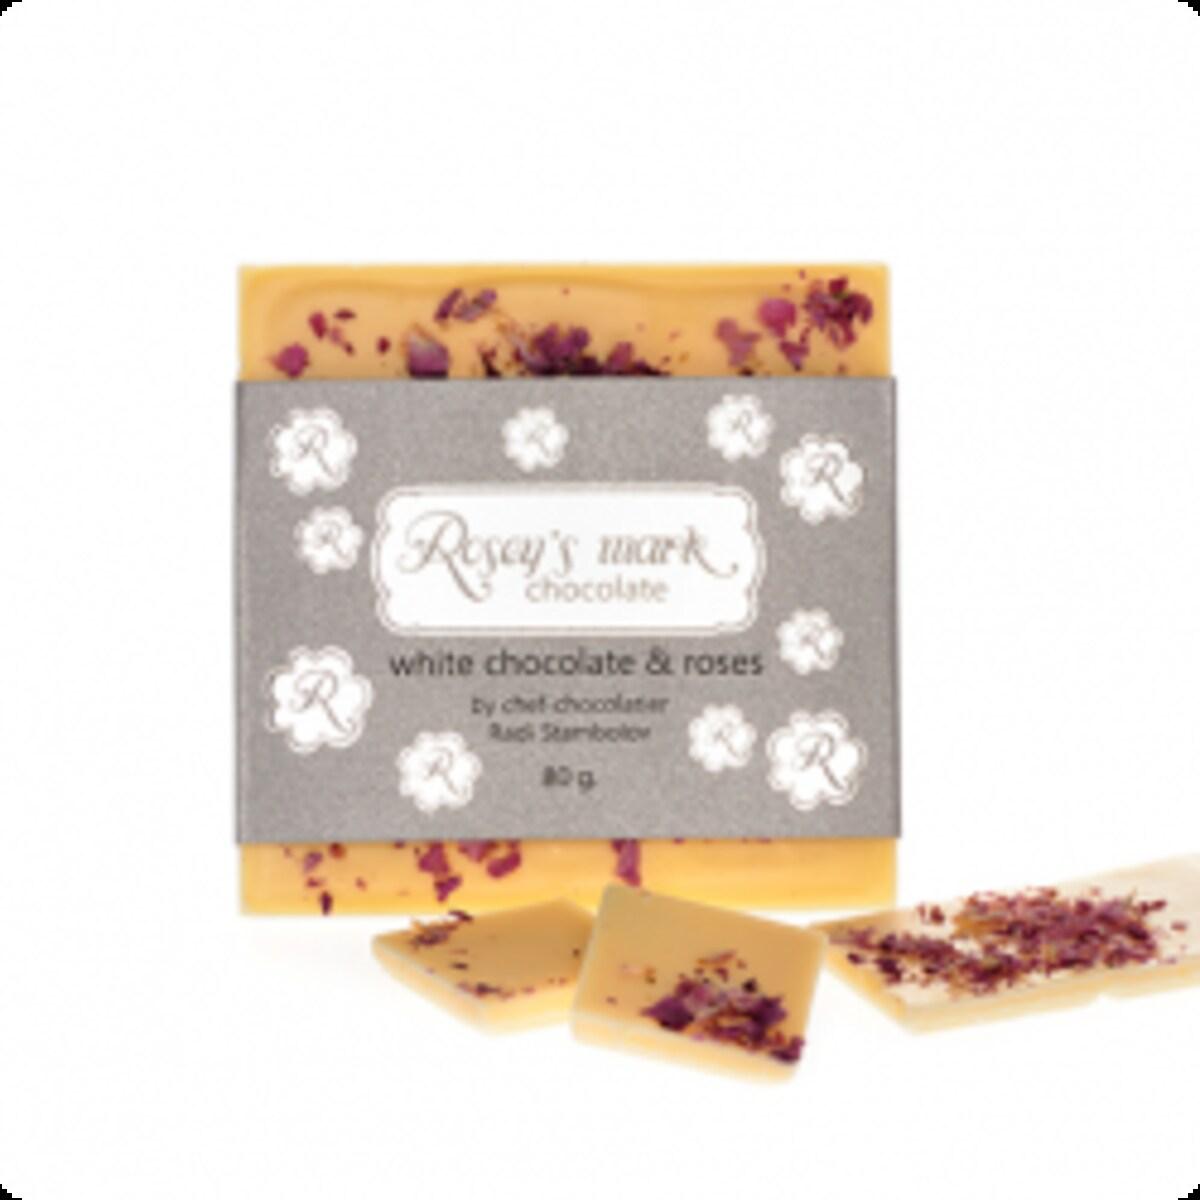 Rosey's mark бял шоколад с рози